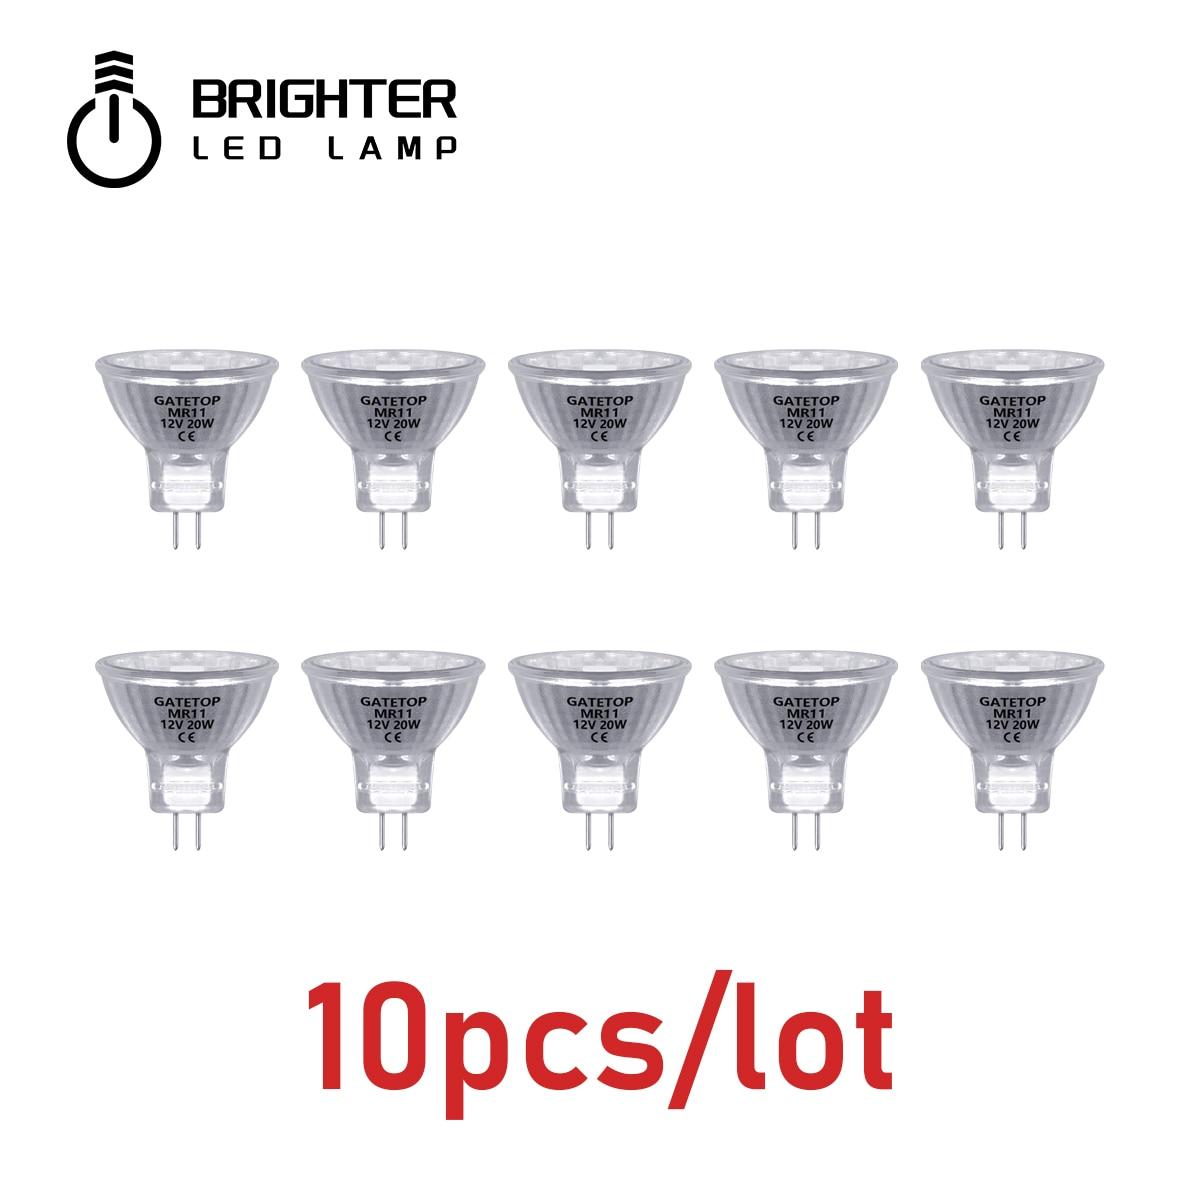 Spotlight Halogen Lamp MR11 10Pcs/Lot 20W 12V Energy Saving GU4 Hot Size